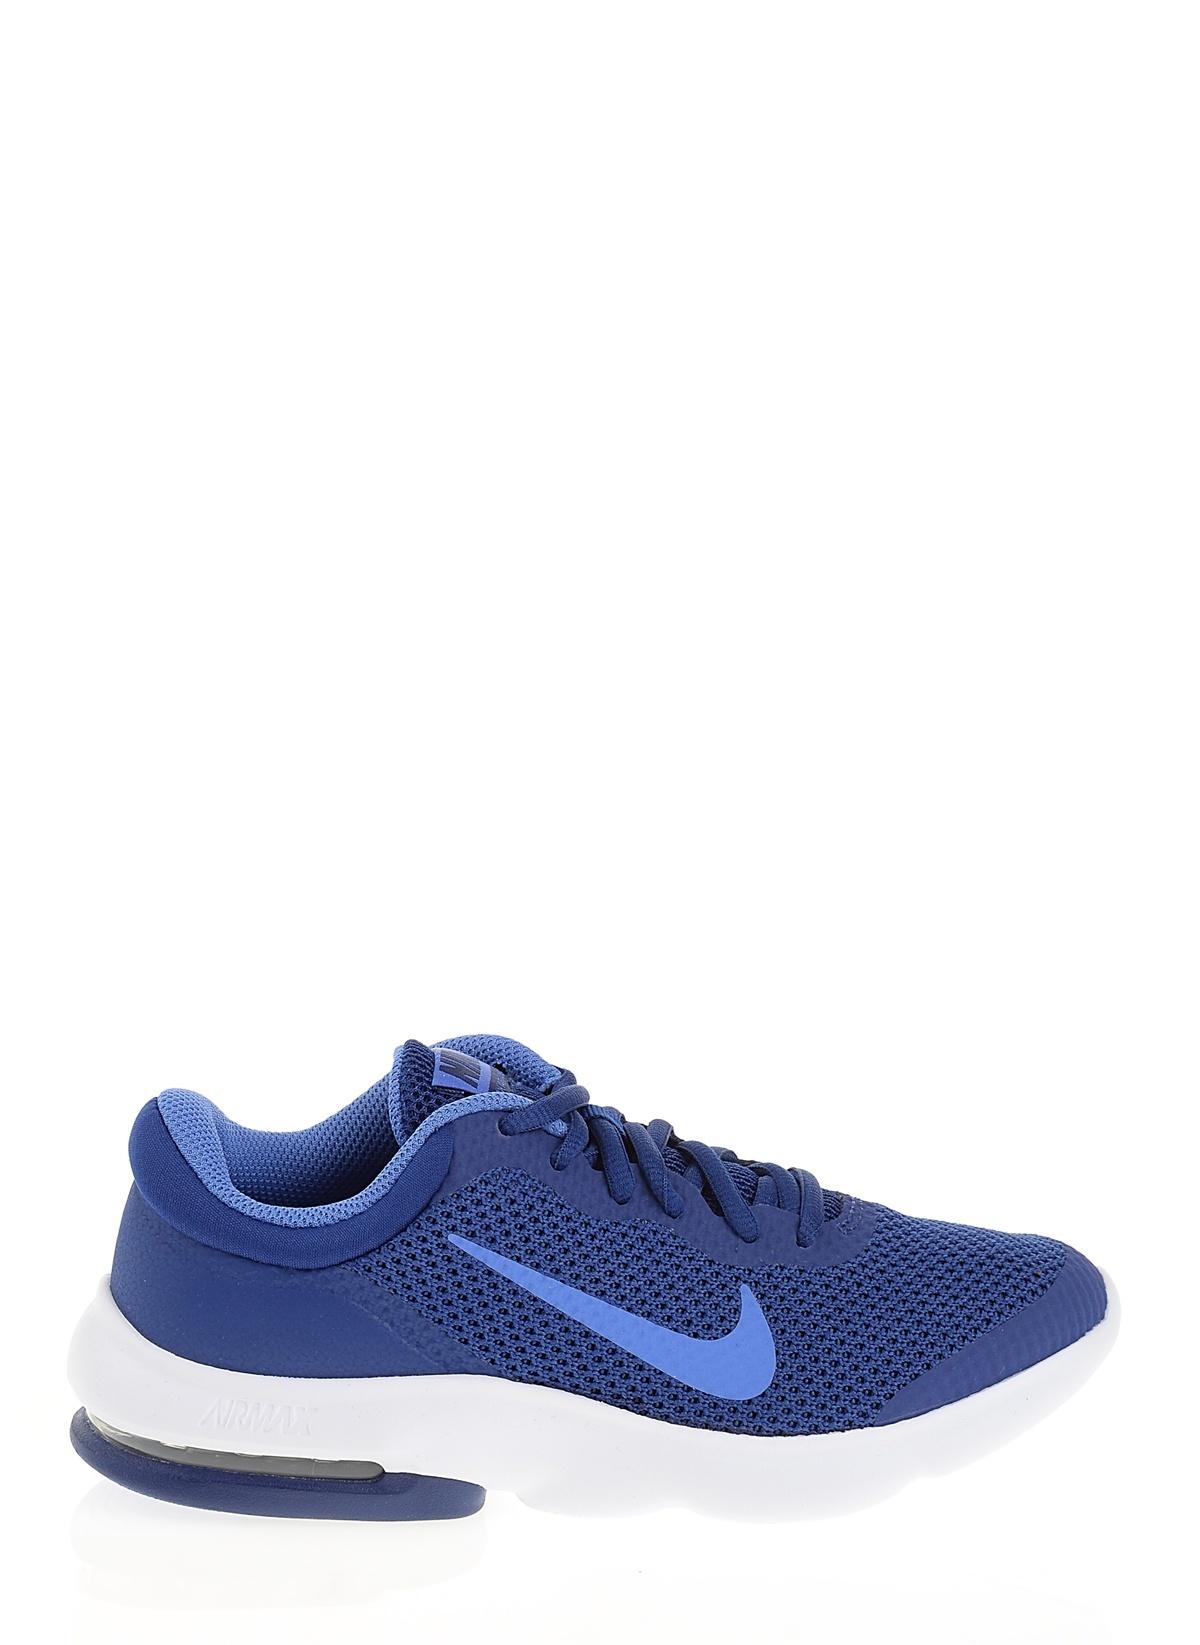 san francisco 0e07b 3d86e ... Nike Nike Air Max Advantage Mavi ...